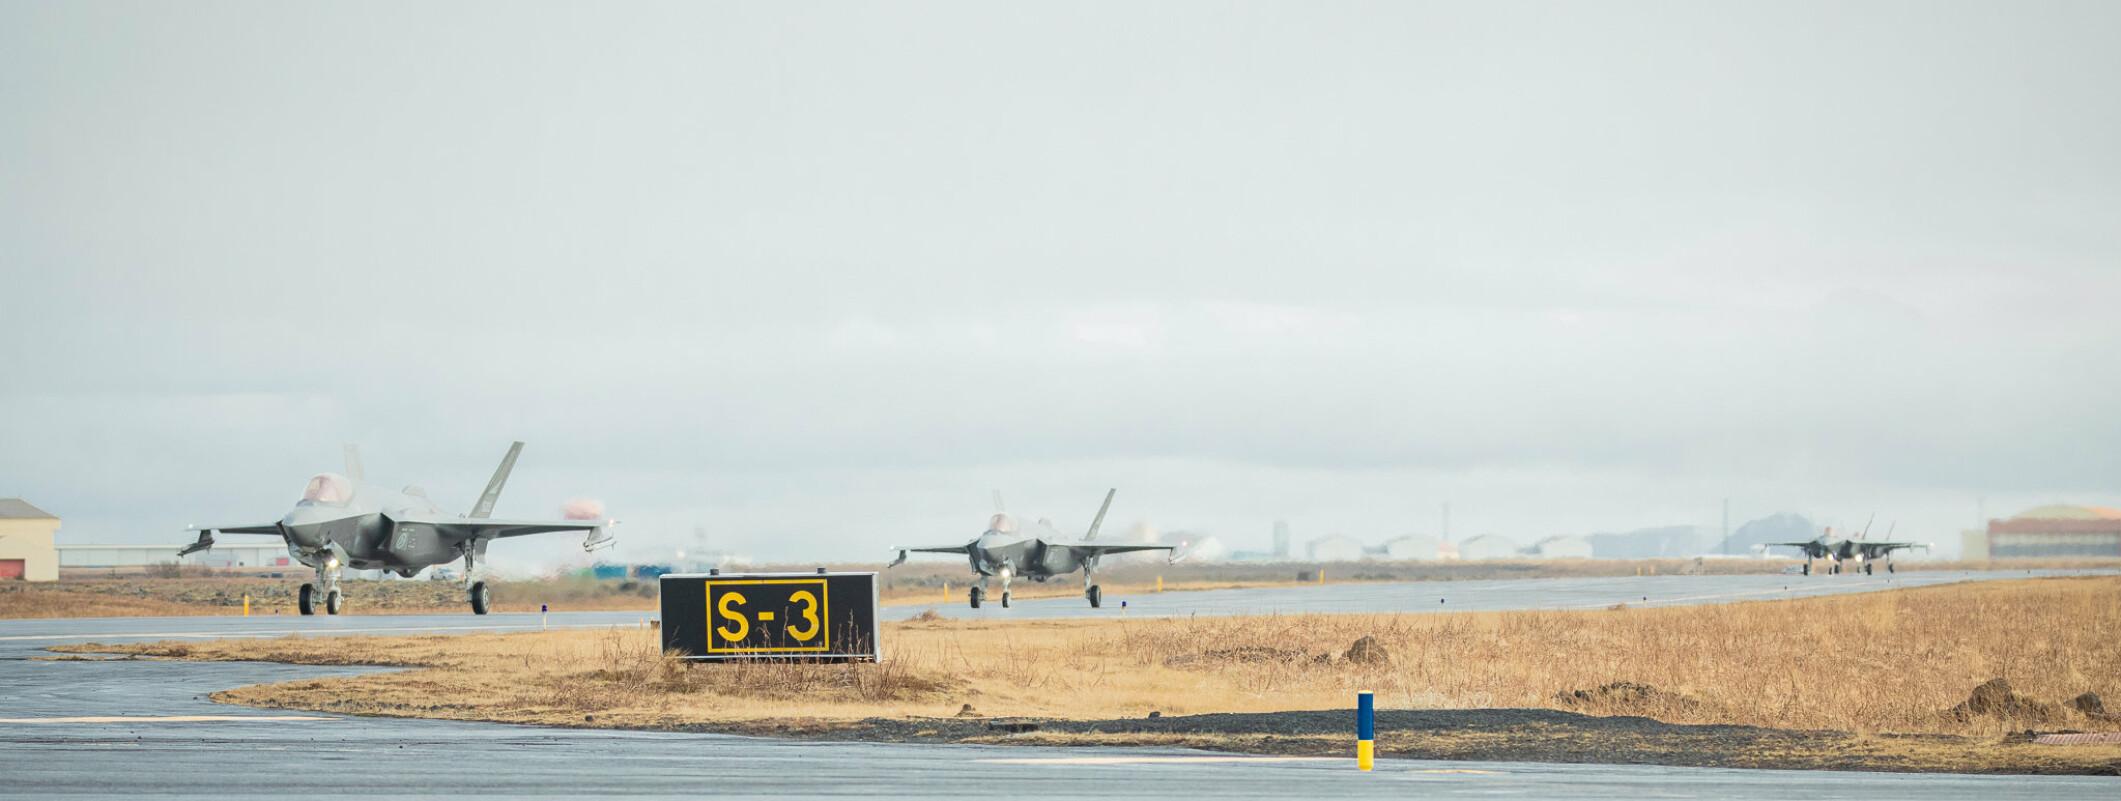 F-35 taxer på Keflavik international airport under oppdraget Icelandic Air Policing 2021. *** Local Caption *** F-35 after landing on Keflavik international airport during Icelandic Air Policing 2021.